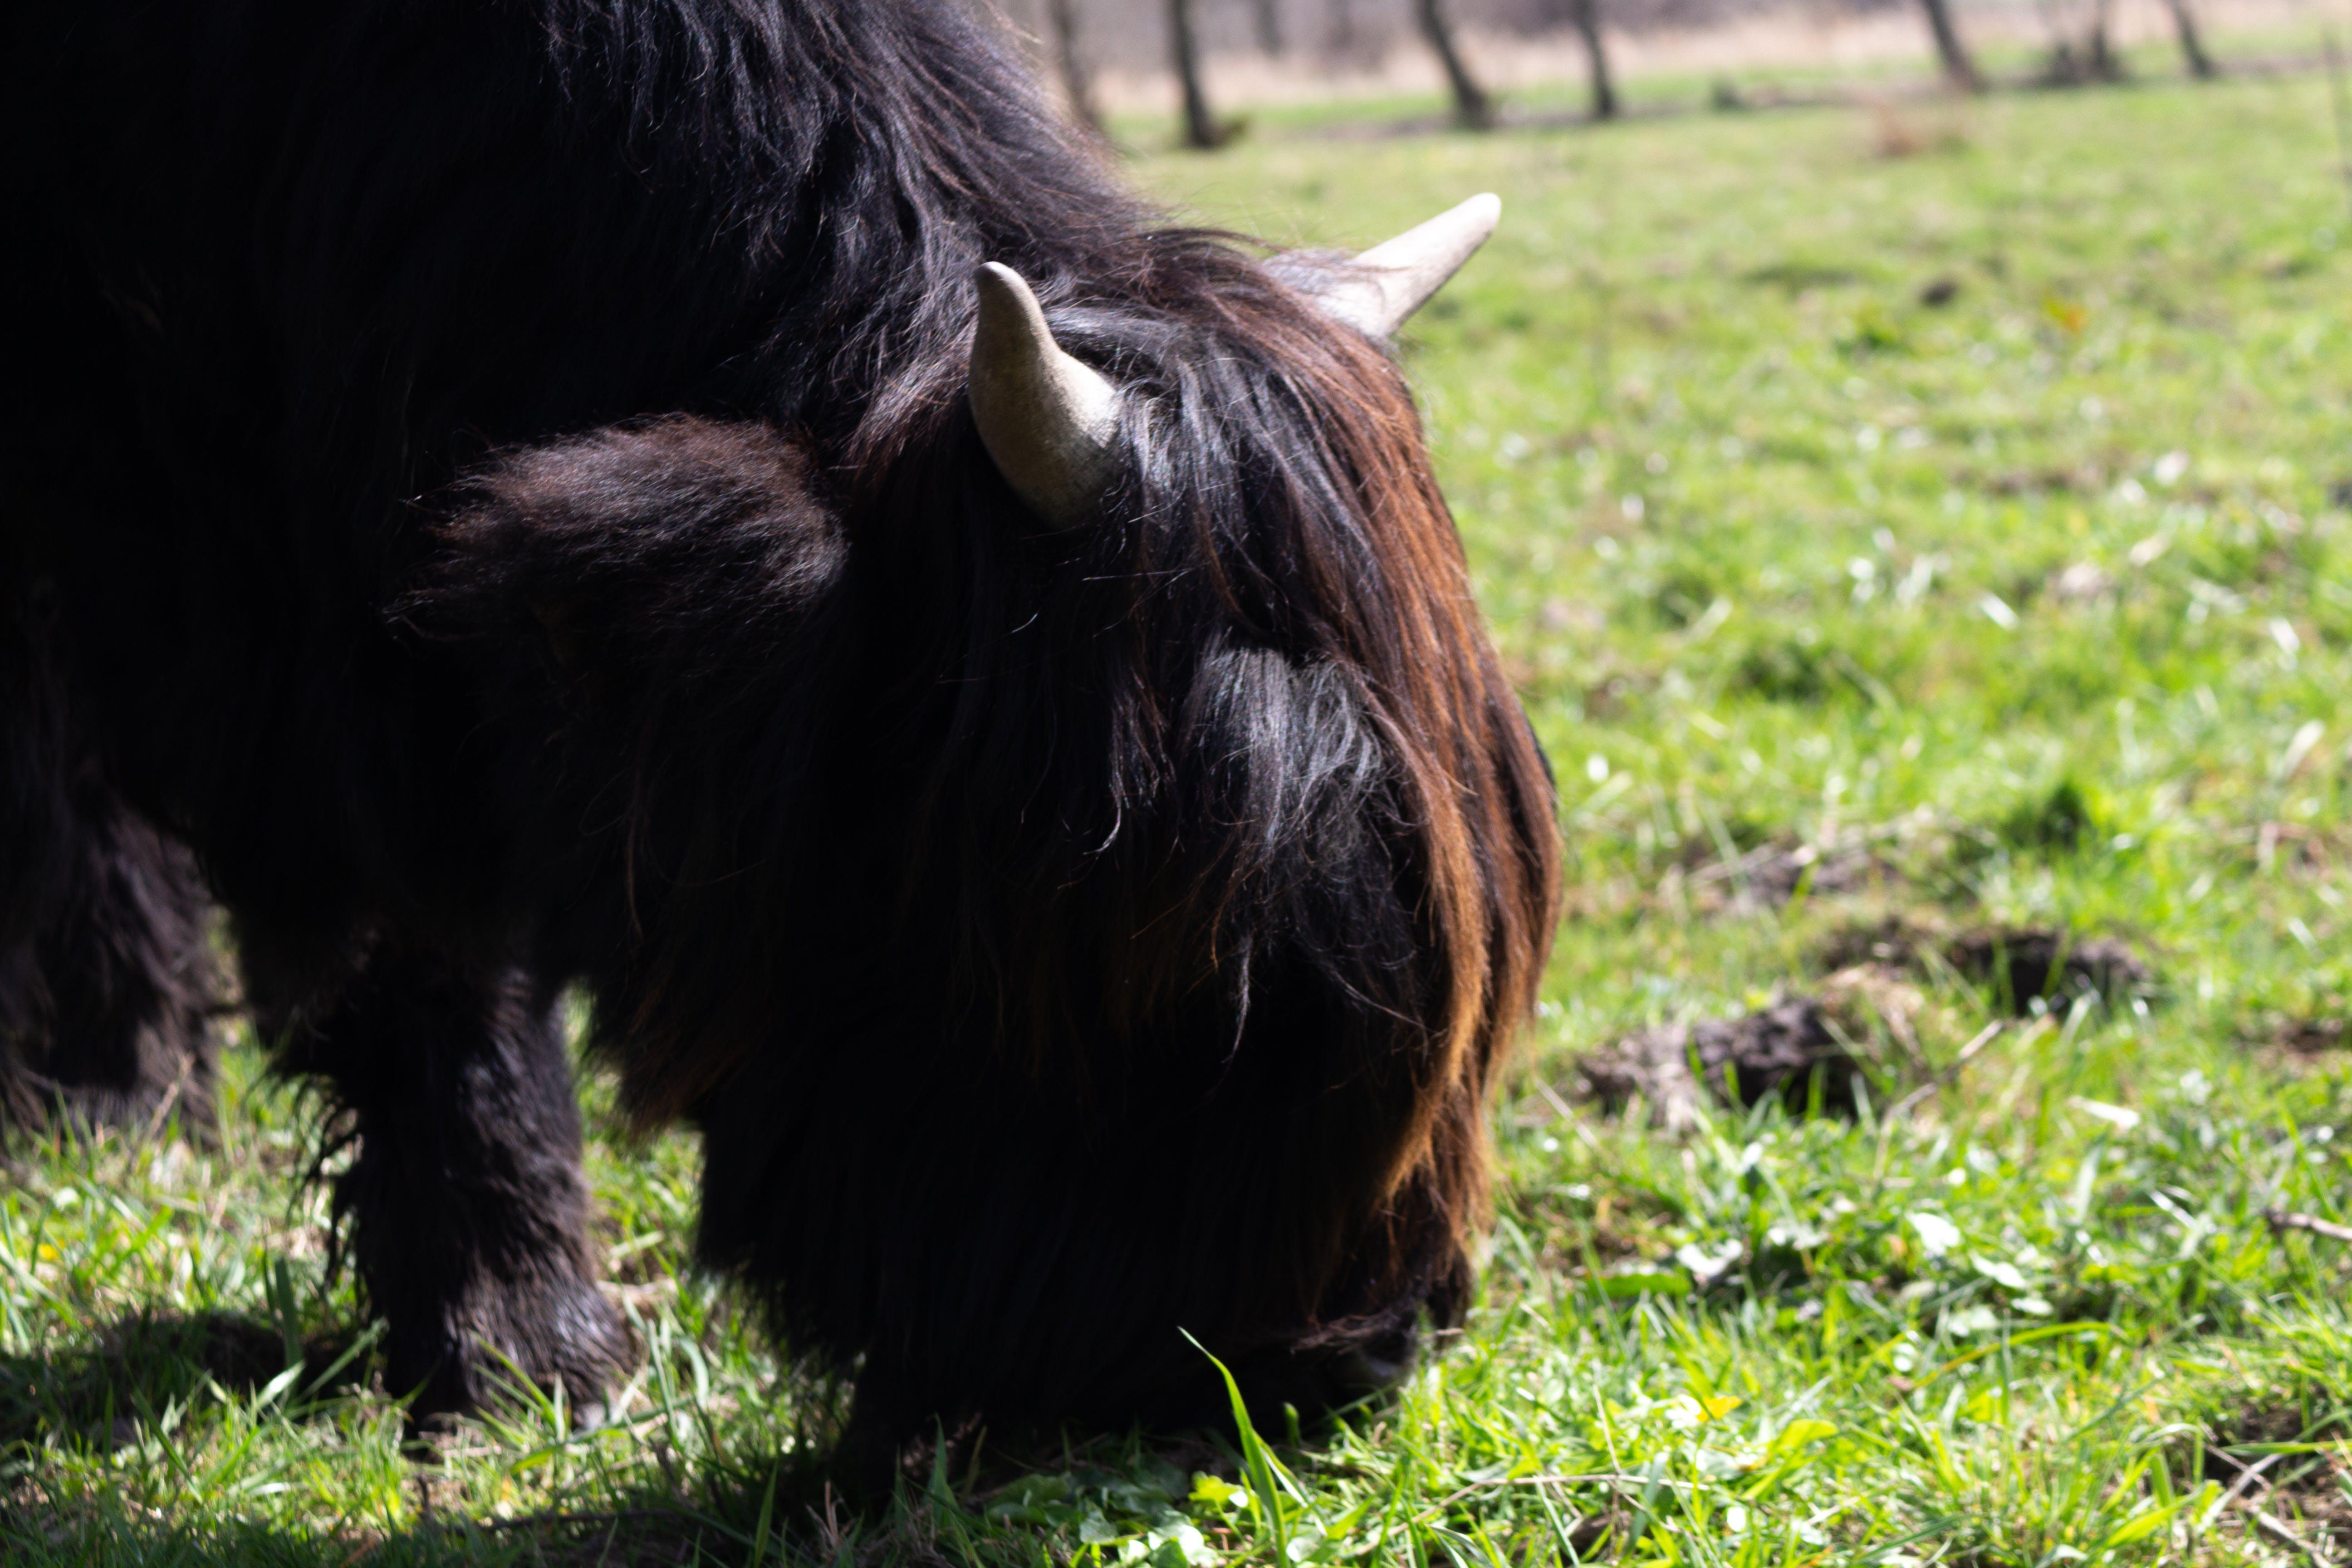 Free stock photo of animal, Burgemeester Rasterhoffpark, netherlands, schotse hooglander